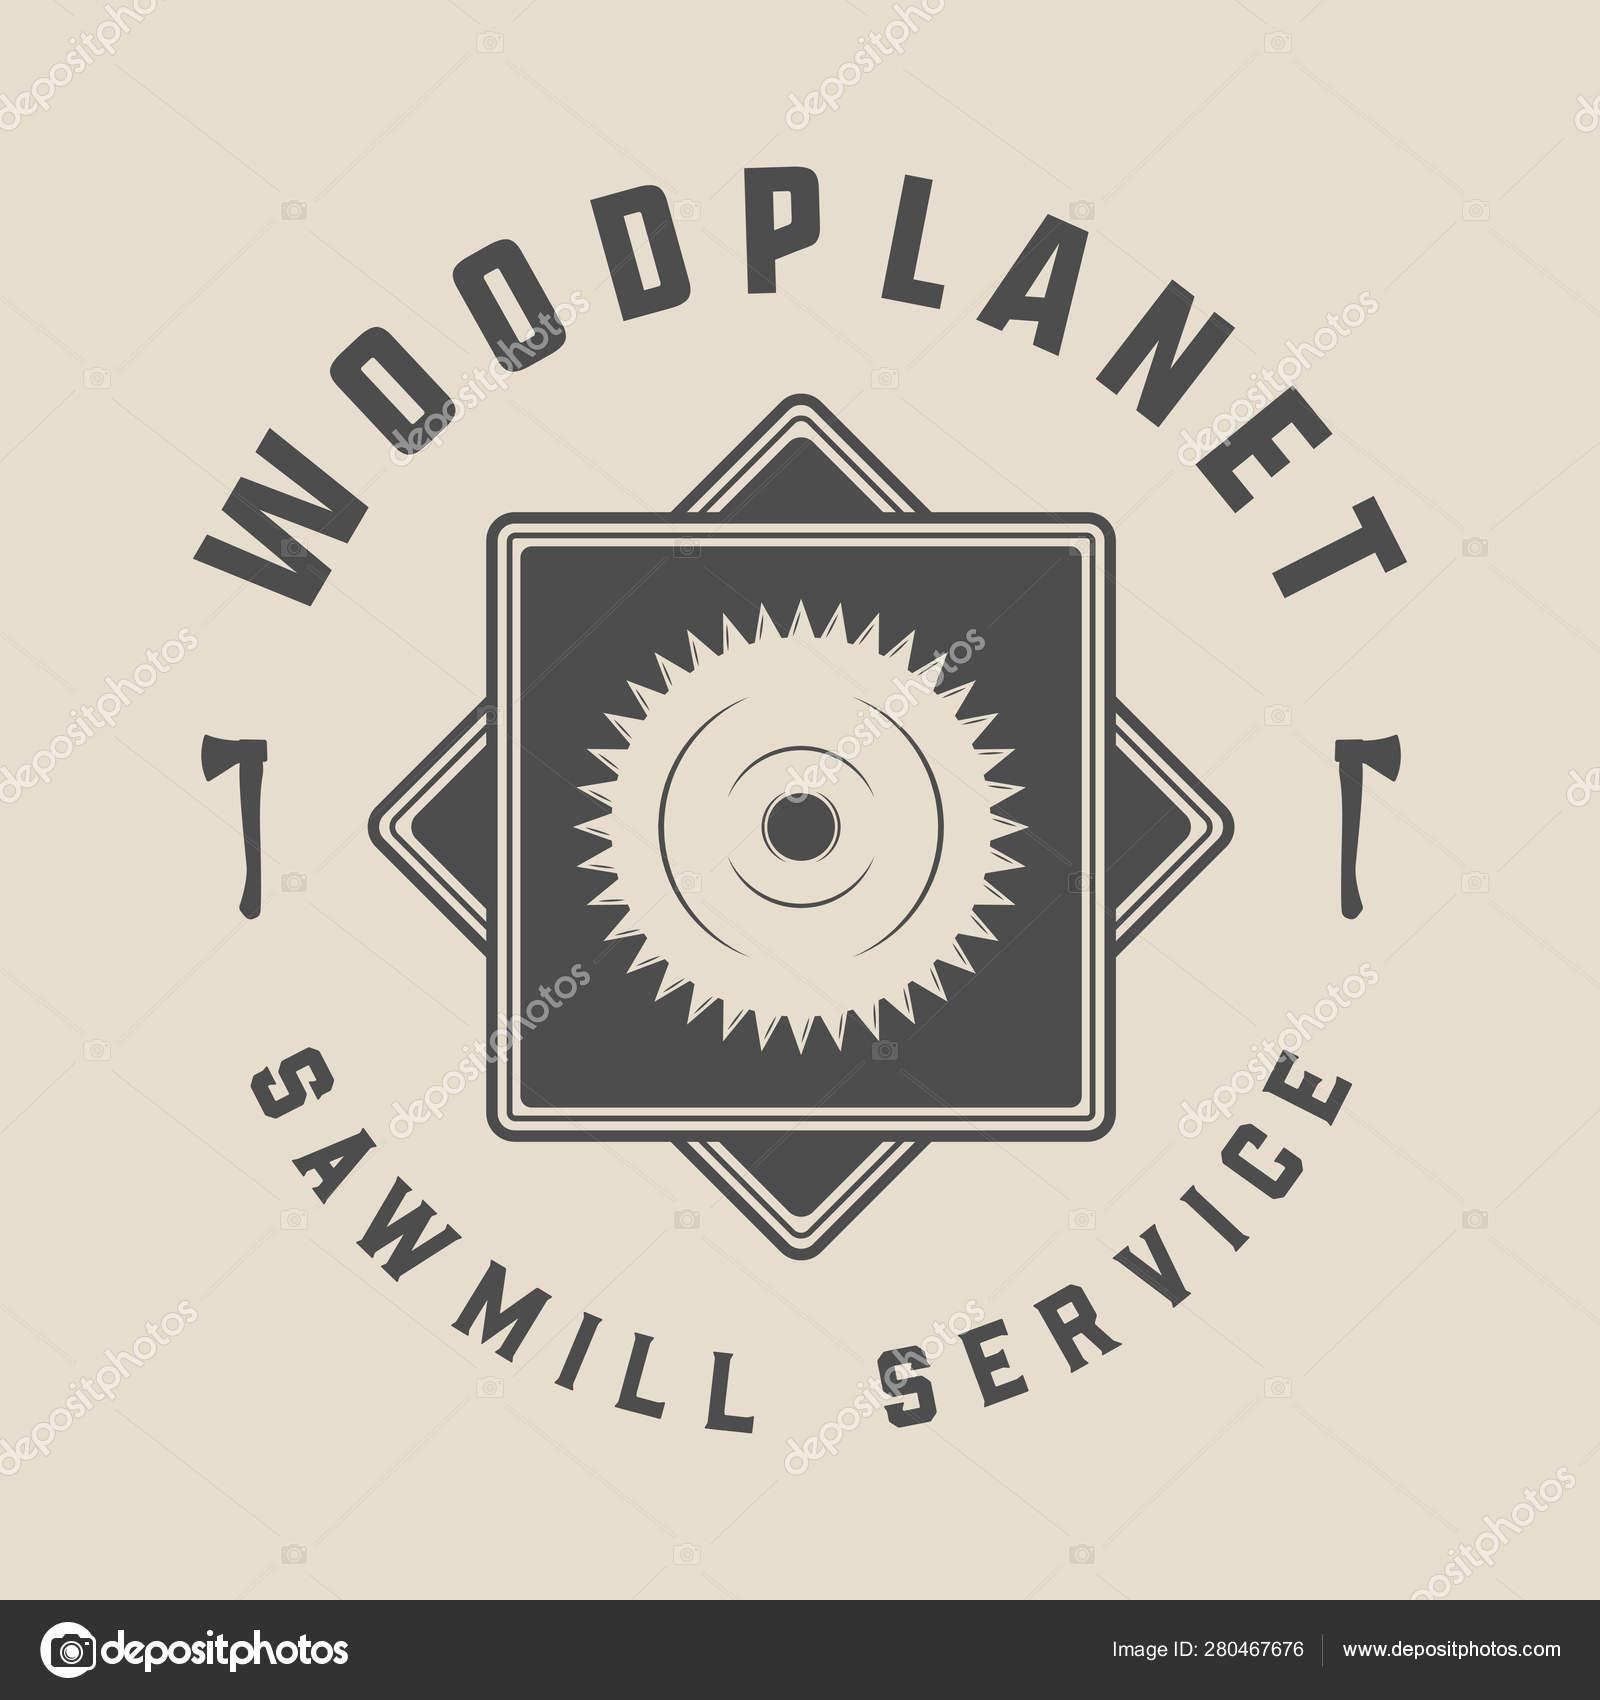 depositphotos stock illustration vintage carpentry woodwork and mechanic